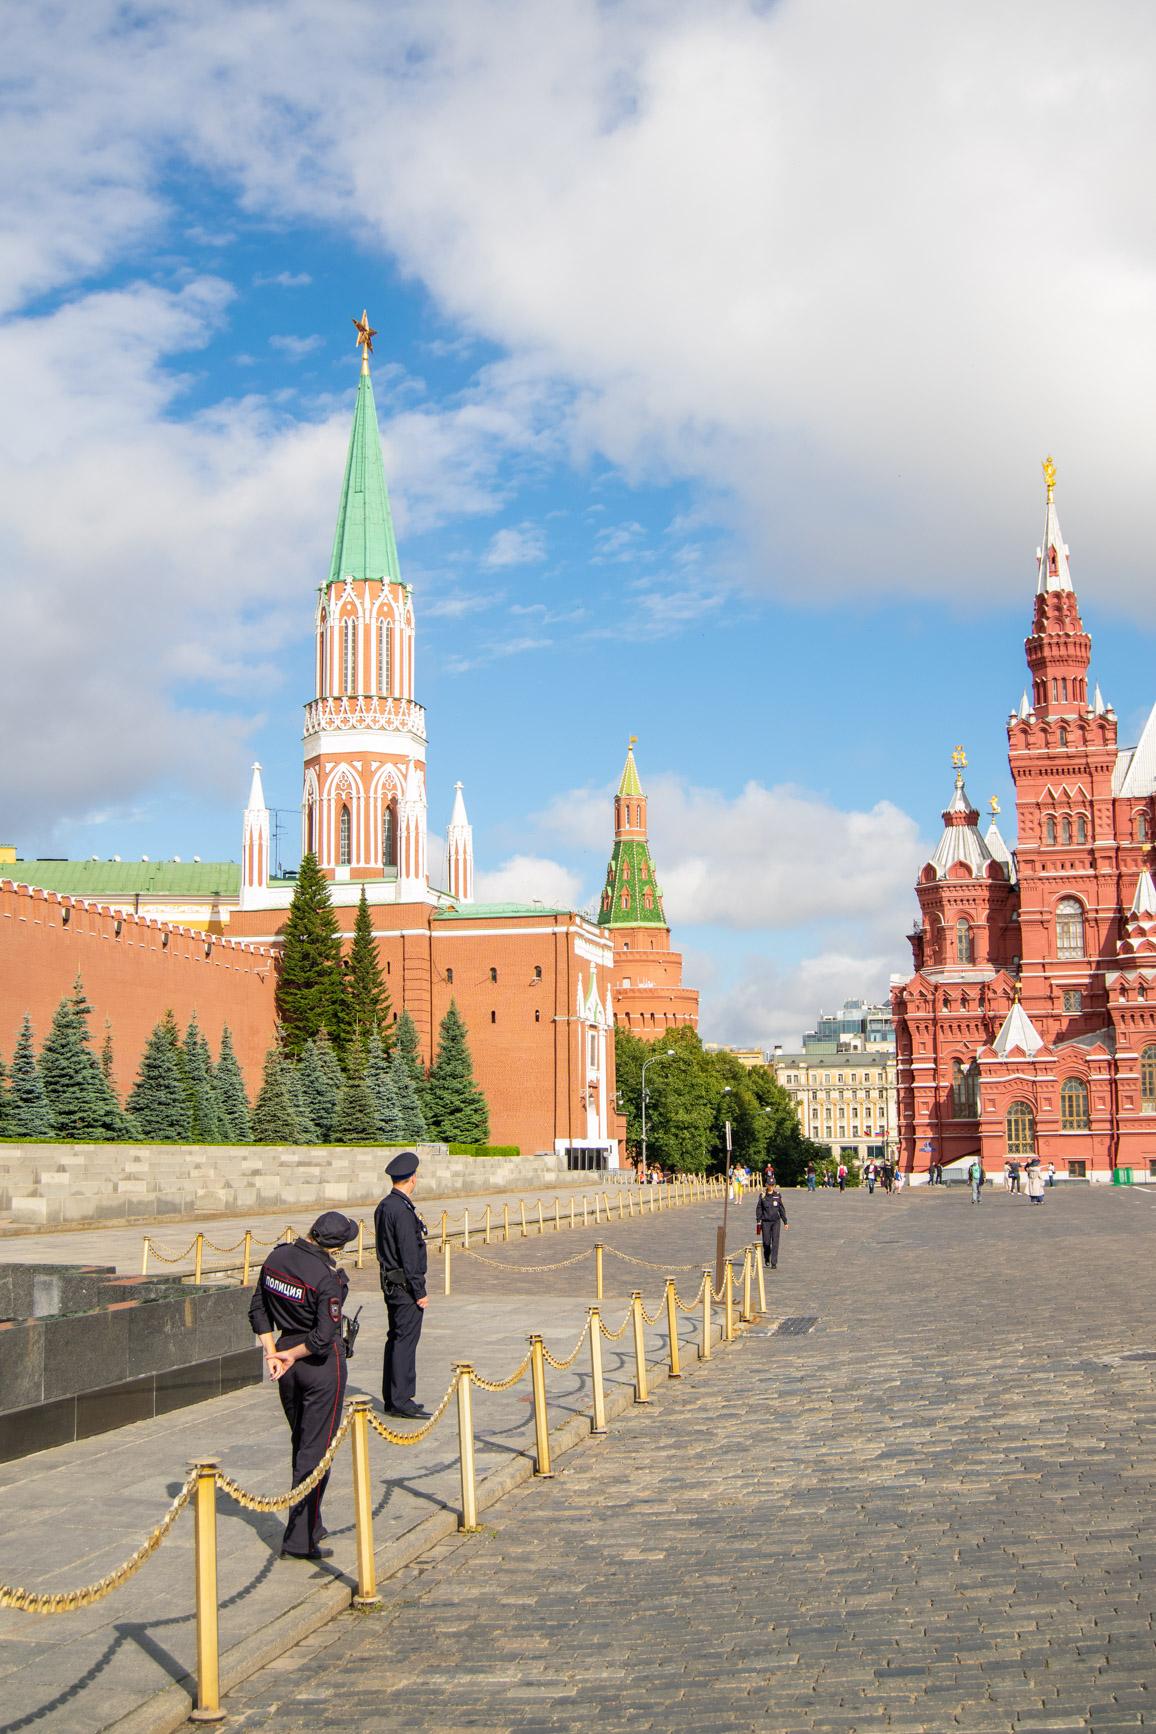 https://bubo.sk/uploads/galleries/4924/martinlipinsky_rusko_moskva_dsc0962.jpg